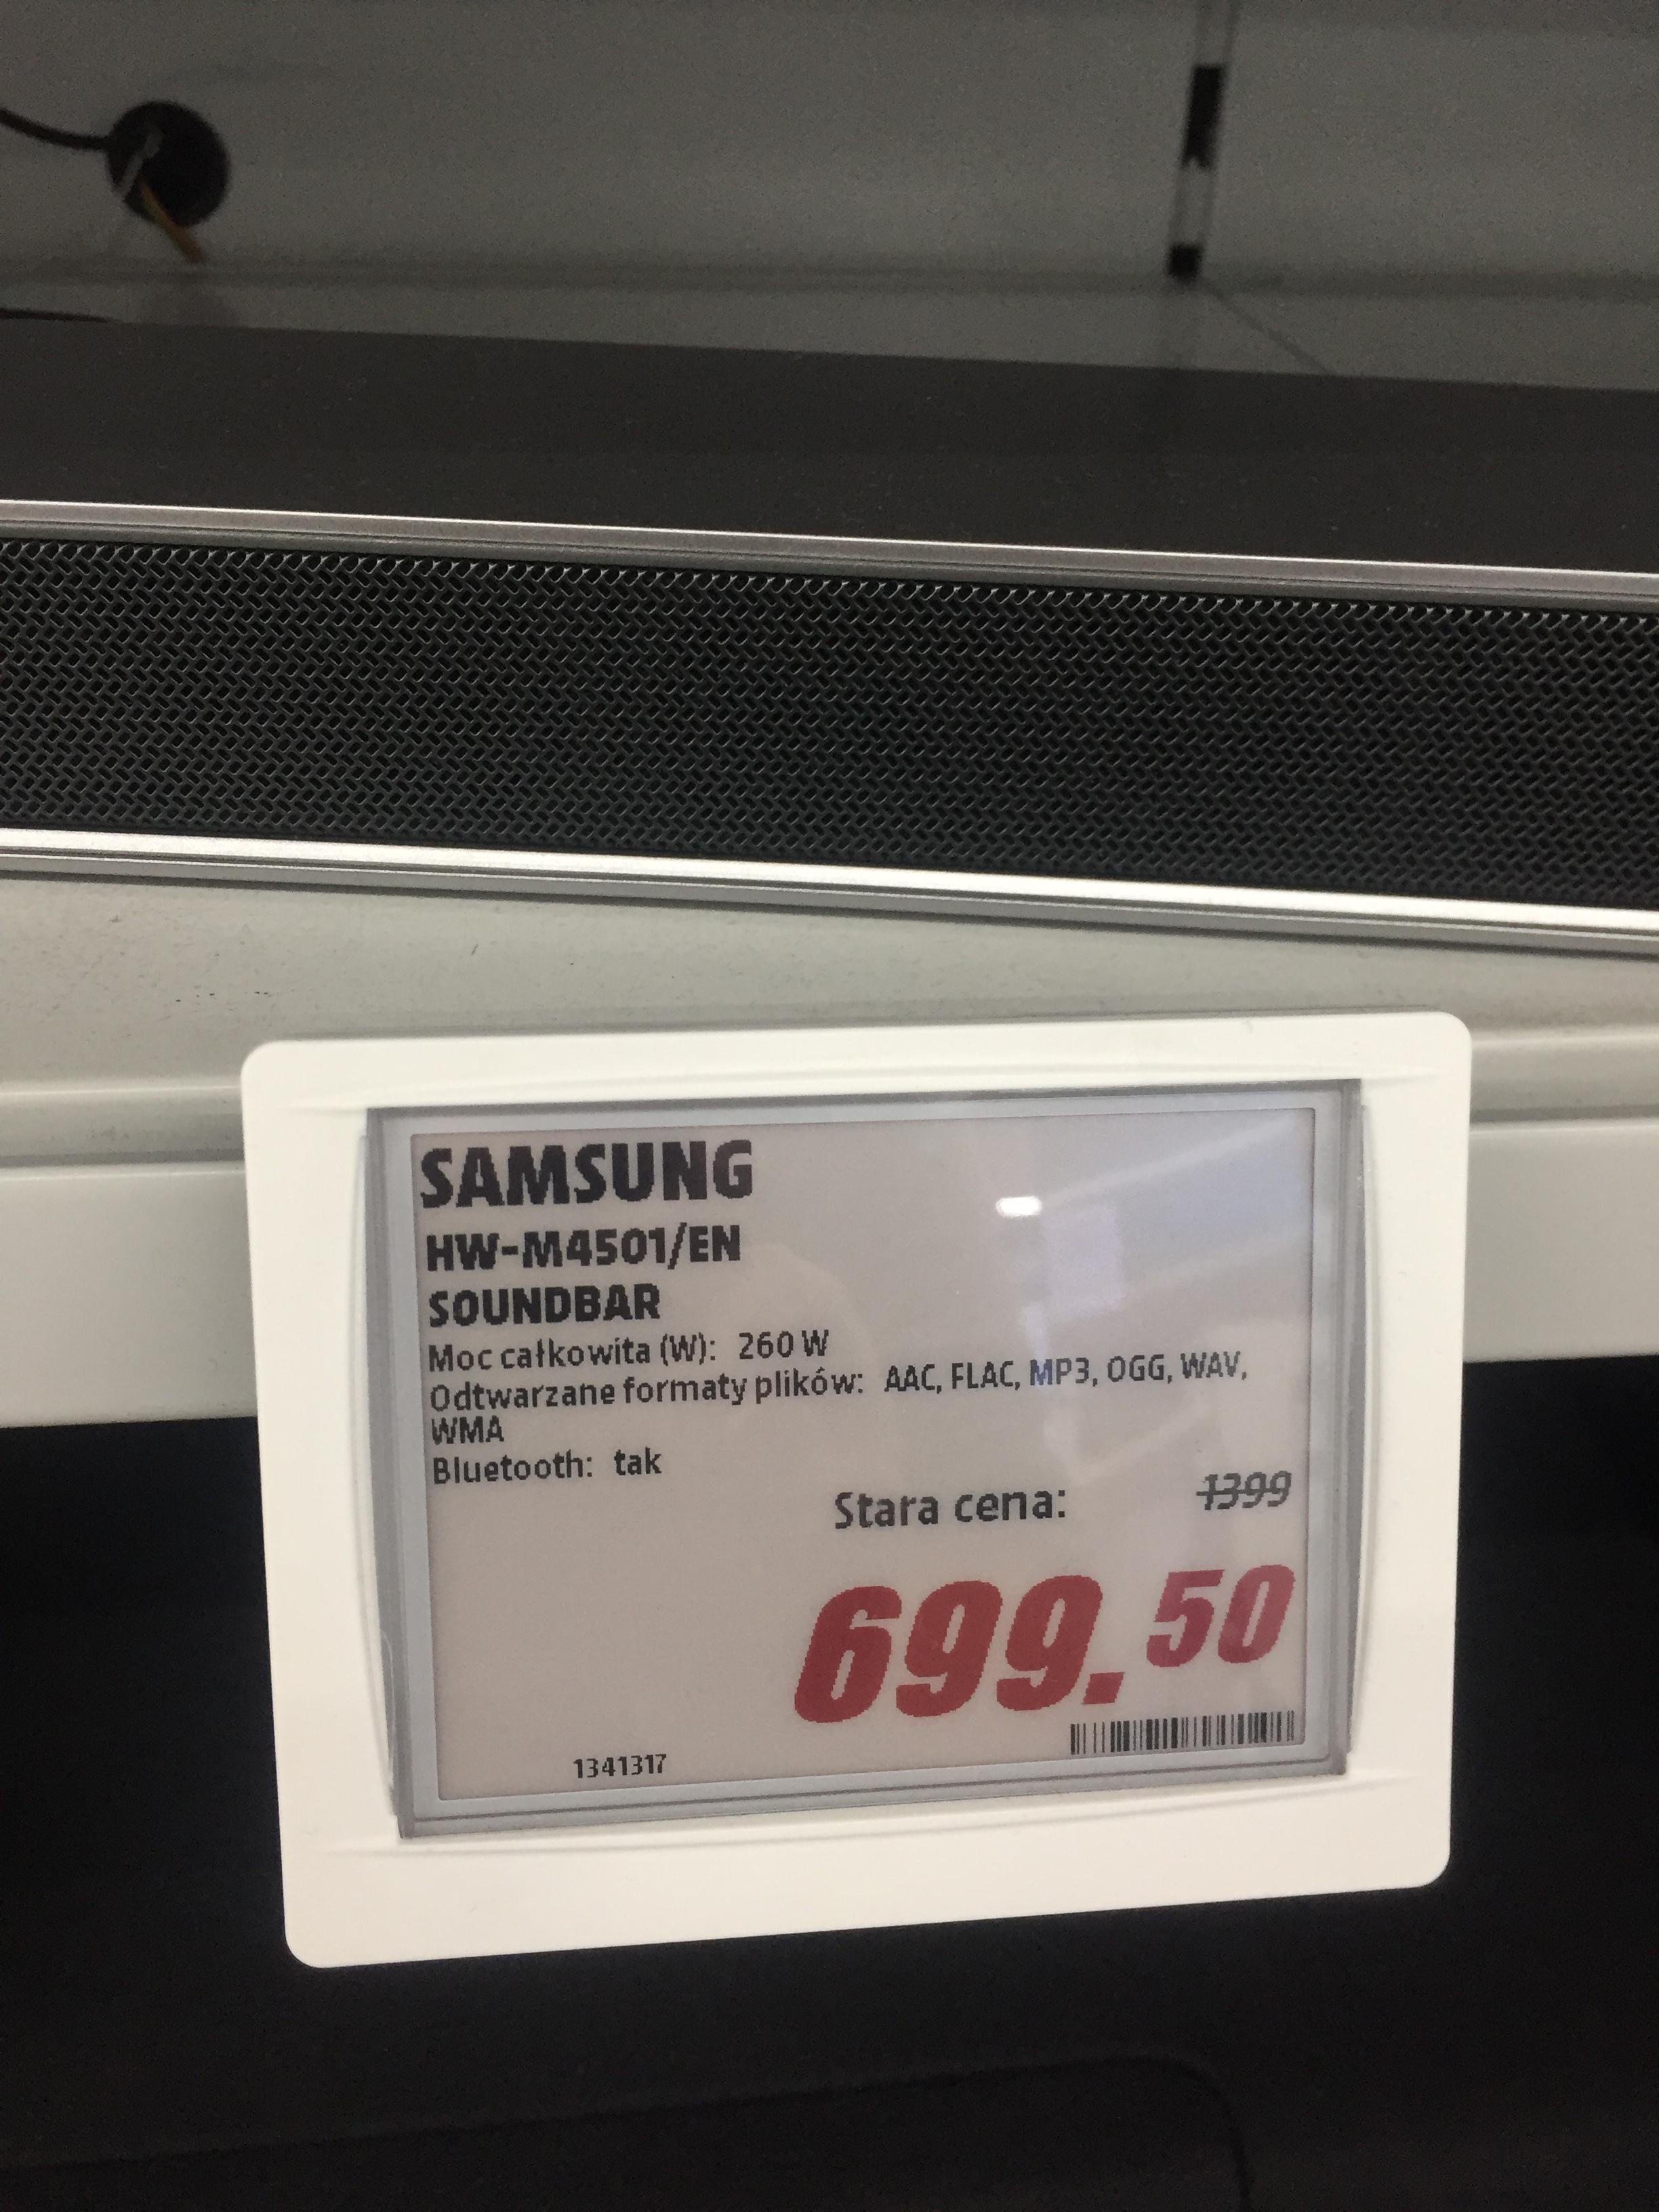 Soundbar Samsung hw-m4501/EN za pół ceny @ mediamarkt